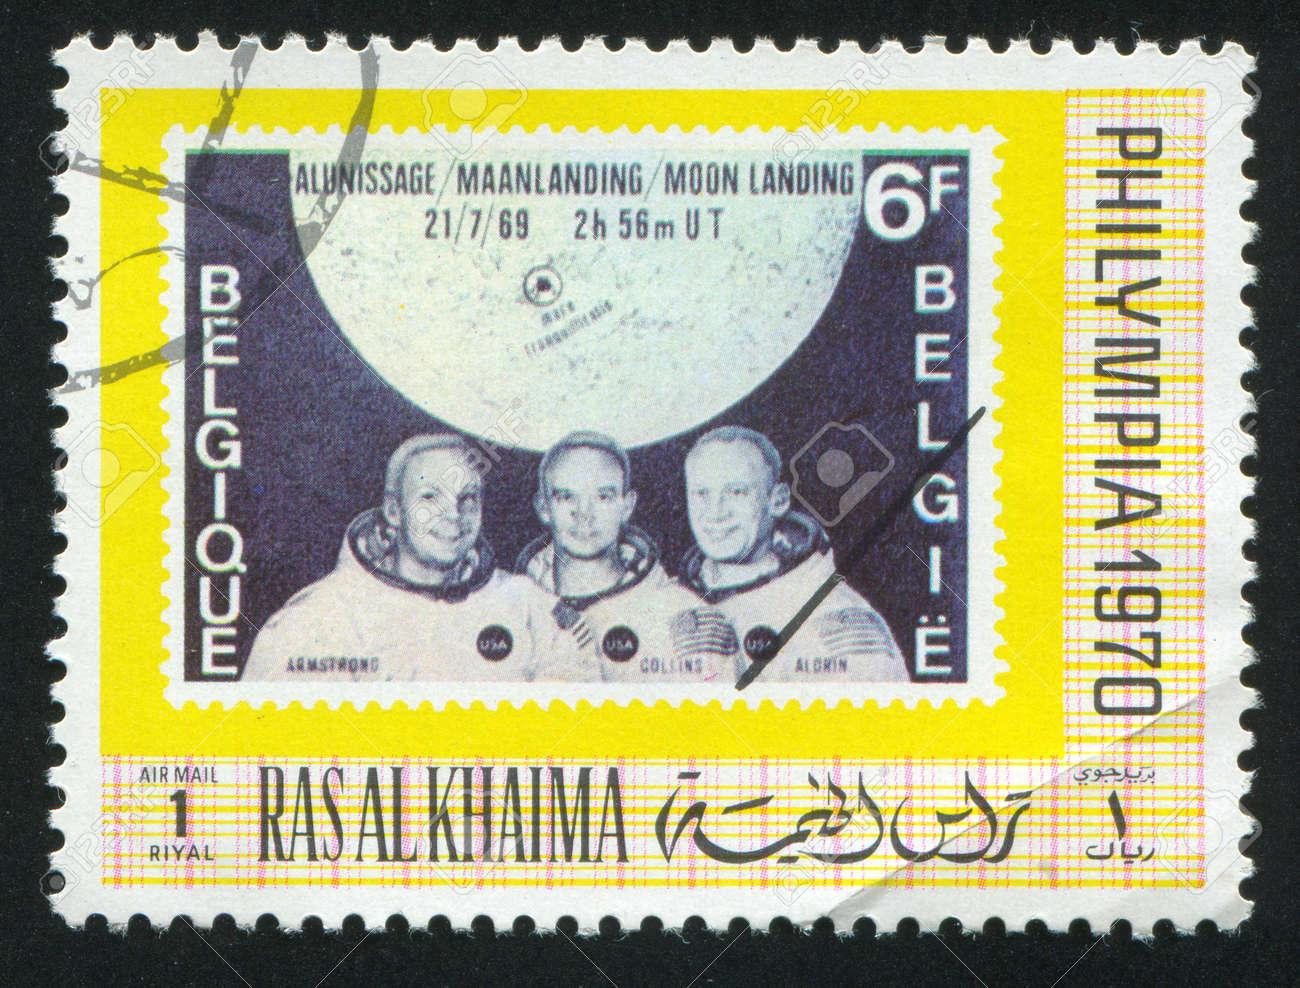 RAS AL KHAIMA - CIRCA 1970: stamp printed by Ras al Khaima, shows Apollo Astronauts, circa 1970 Stock Photo - 17145290